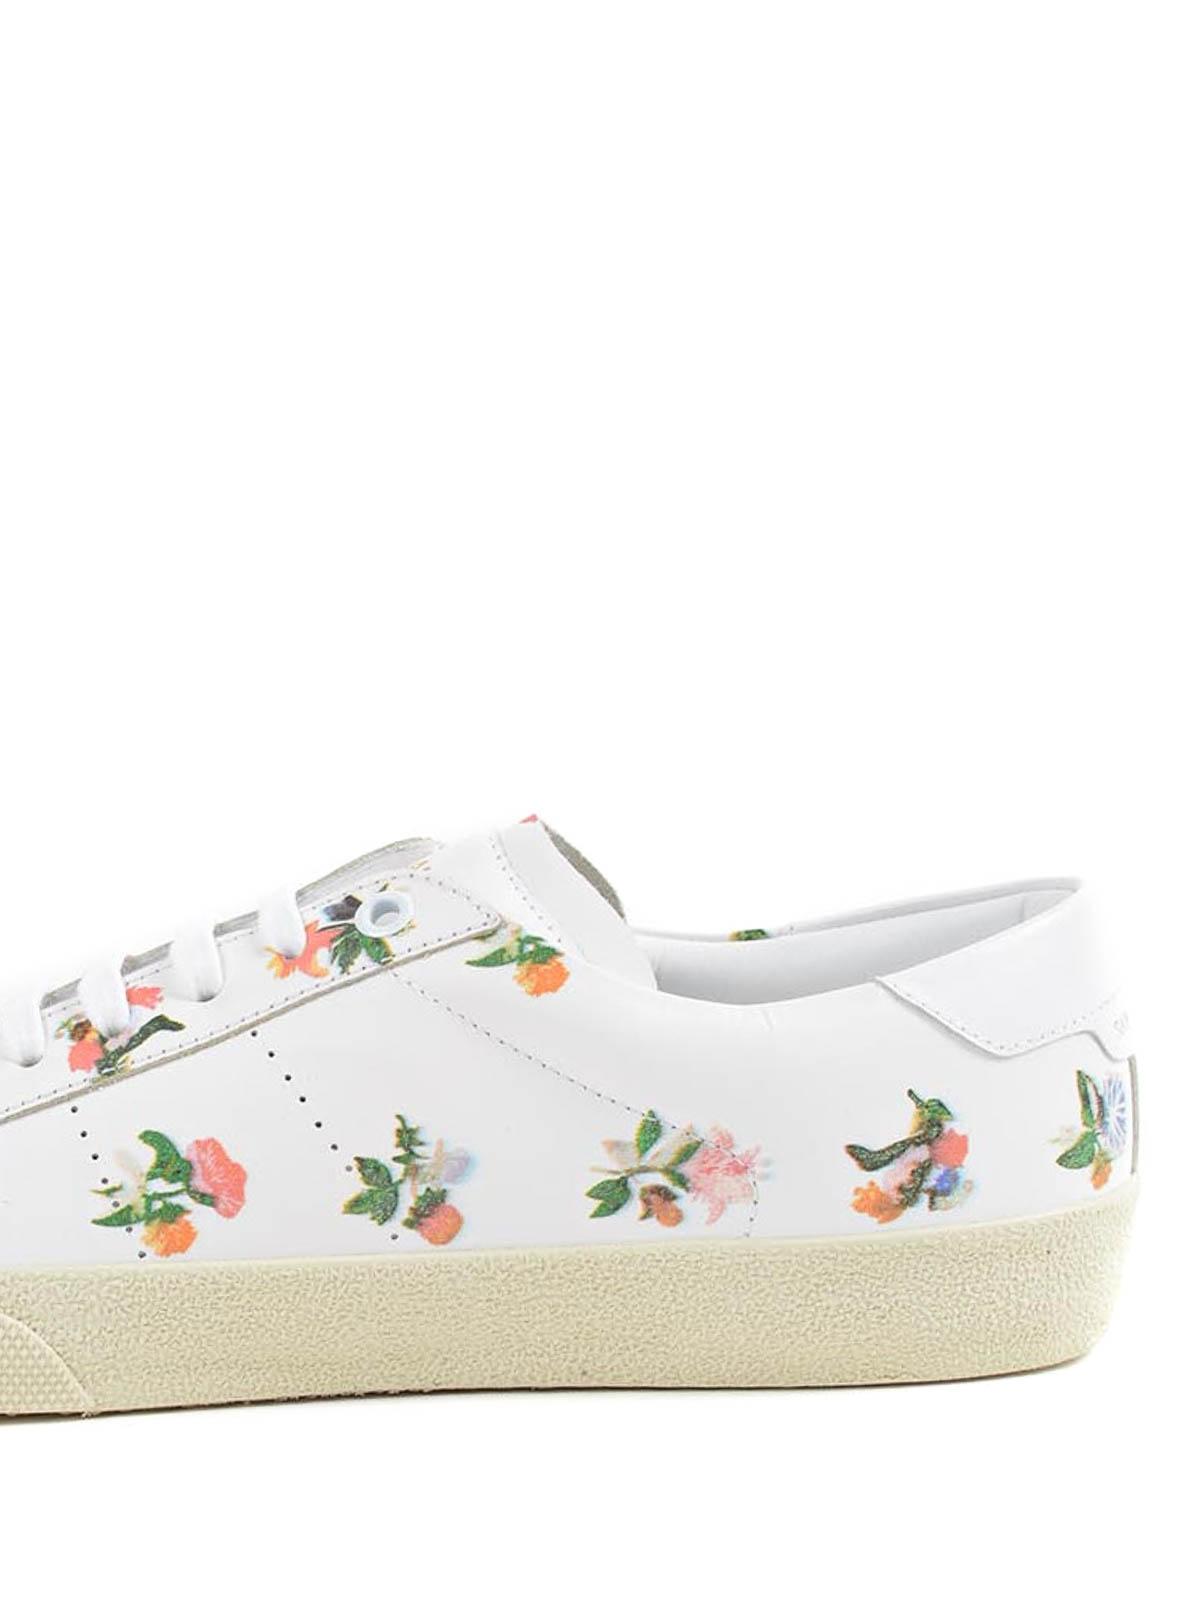 Saint Laurent - Praire Flower sneakers - trainers - 419195 DH430 9072 1e1f3bf36a3d